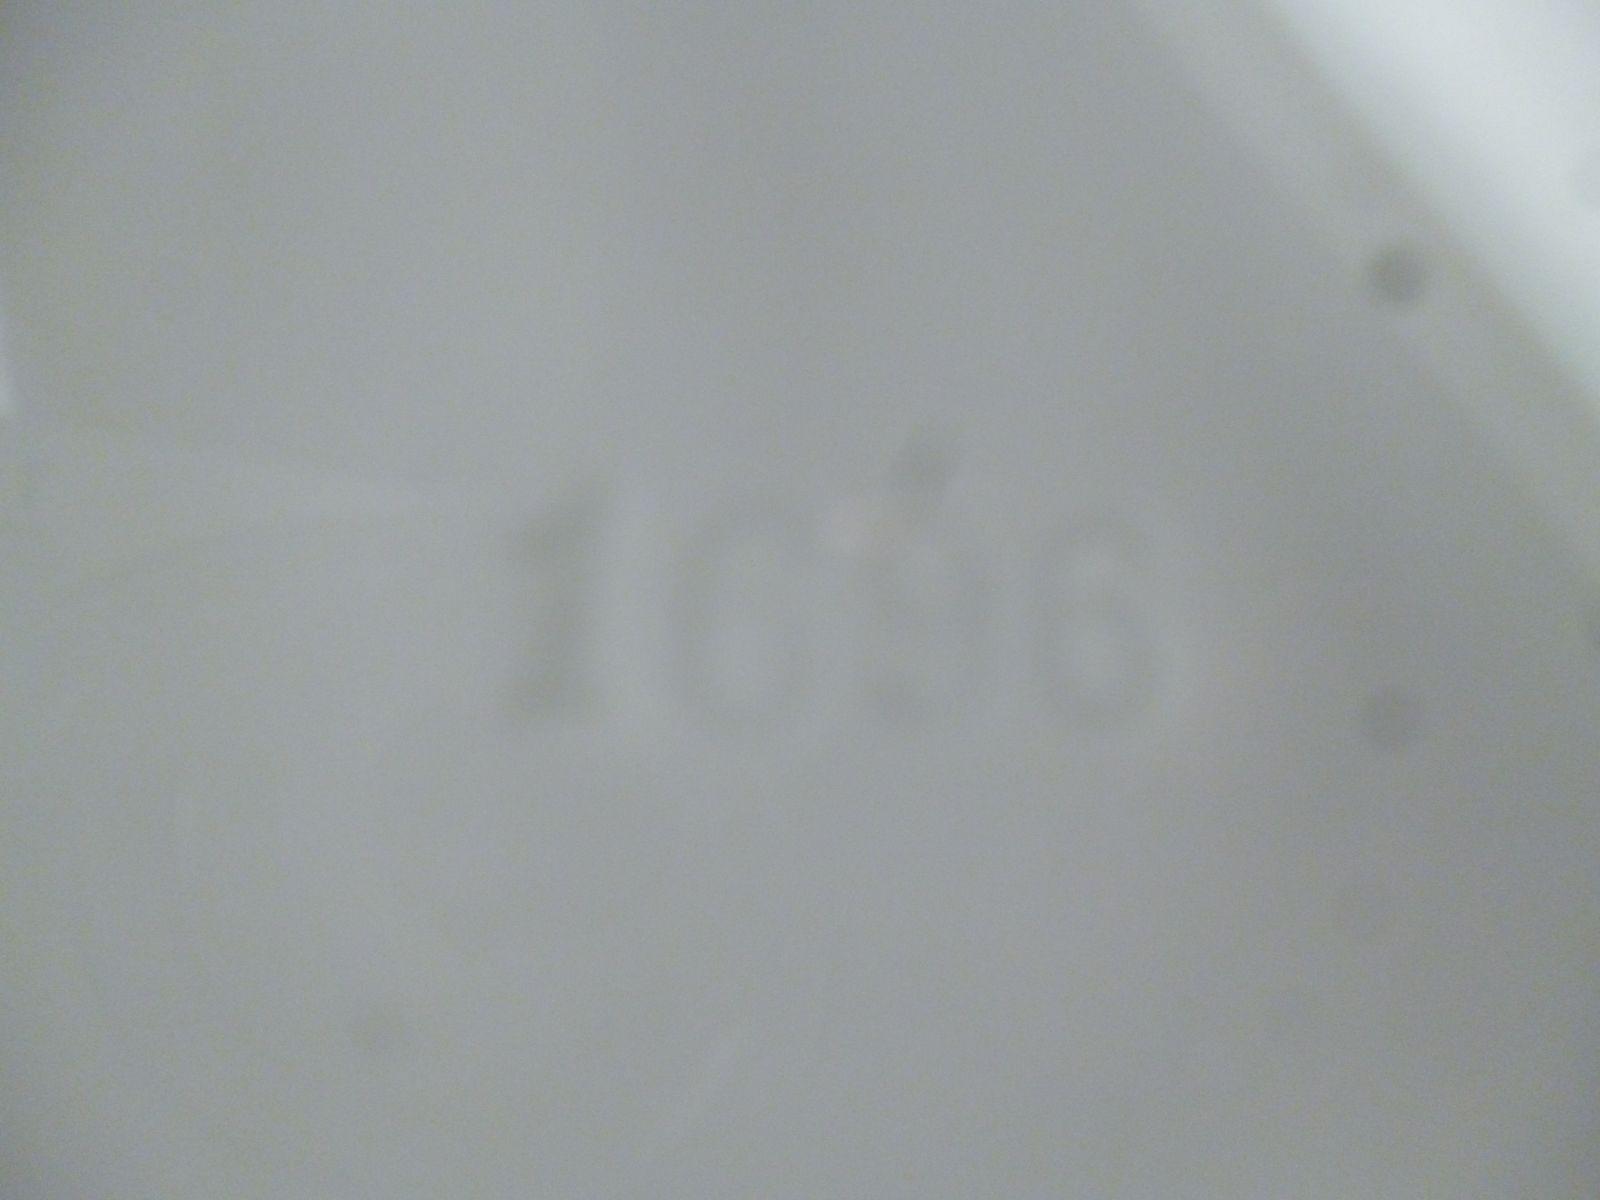 P1340700.JPG (1600×1200)